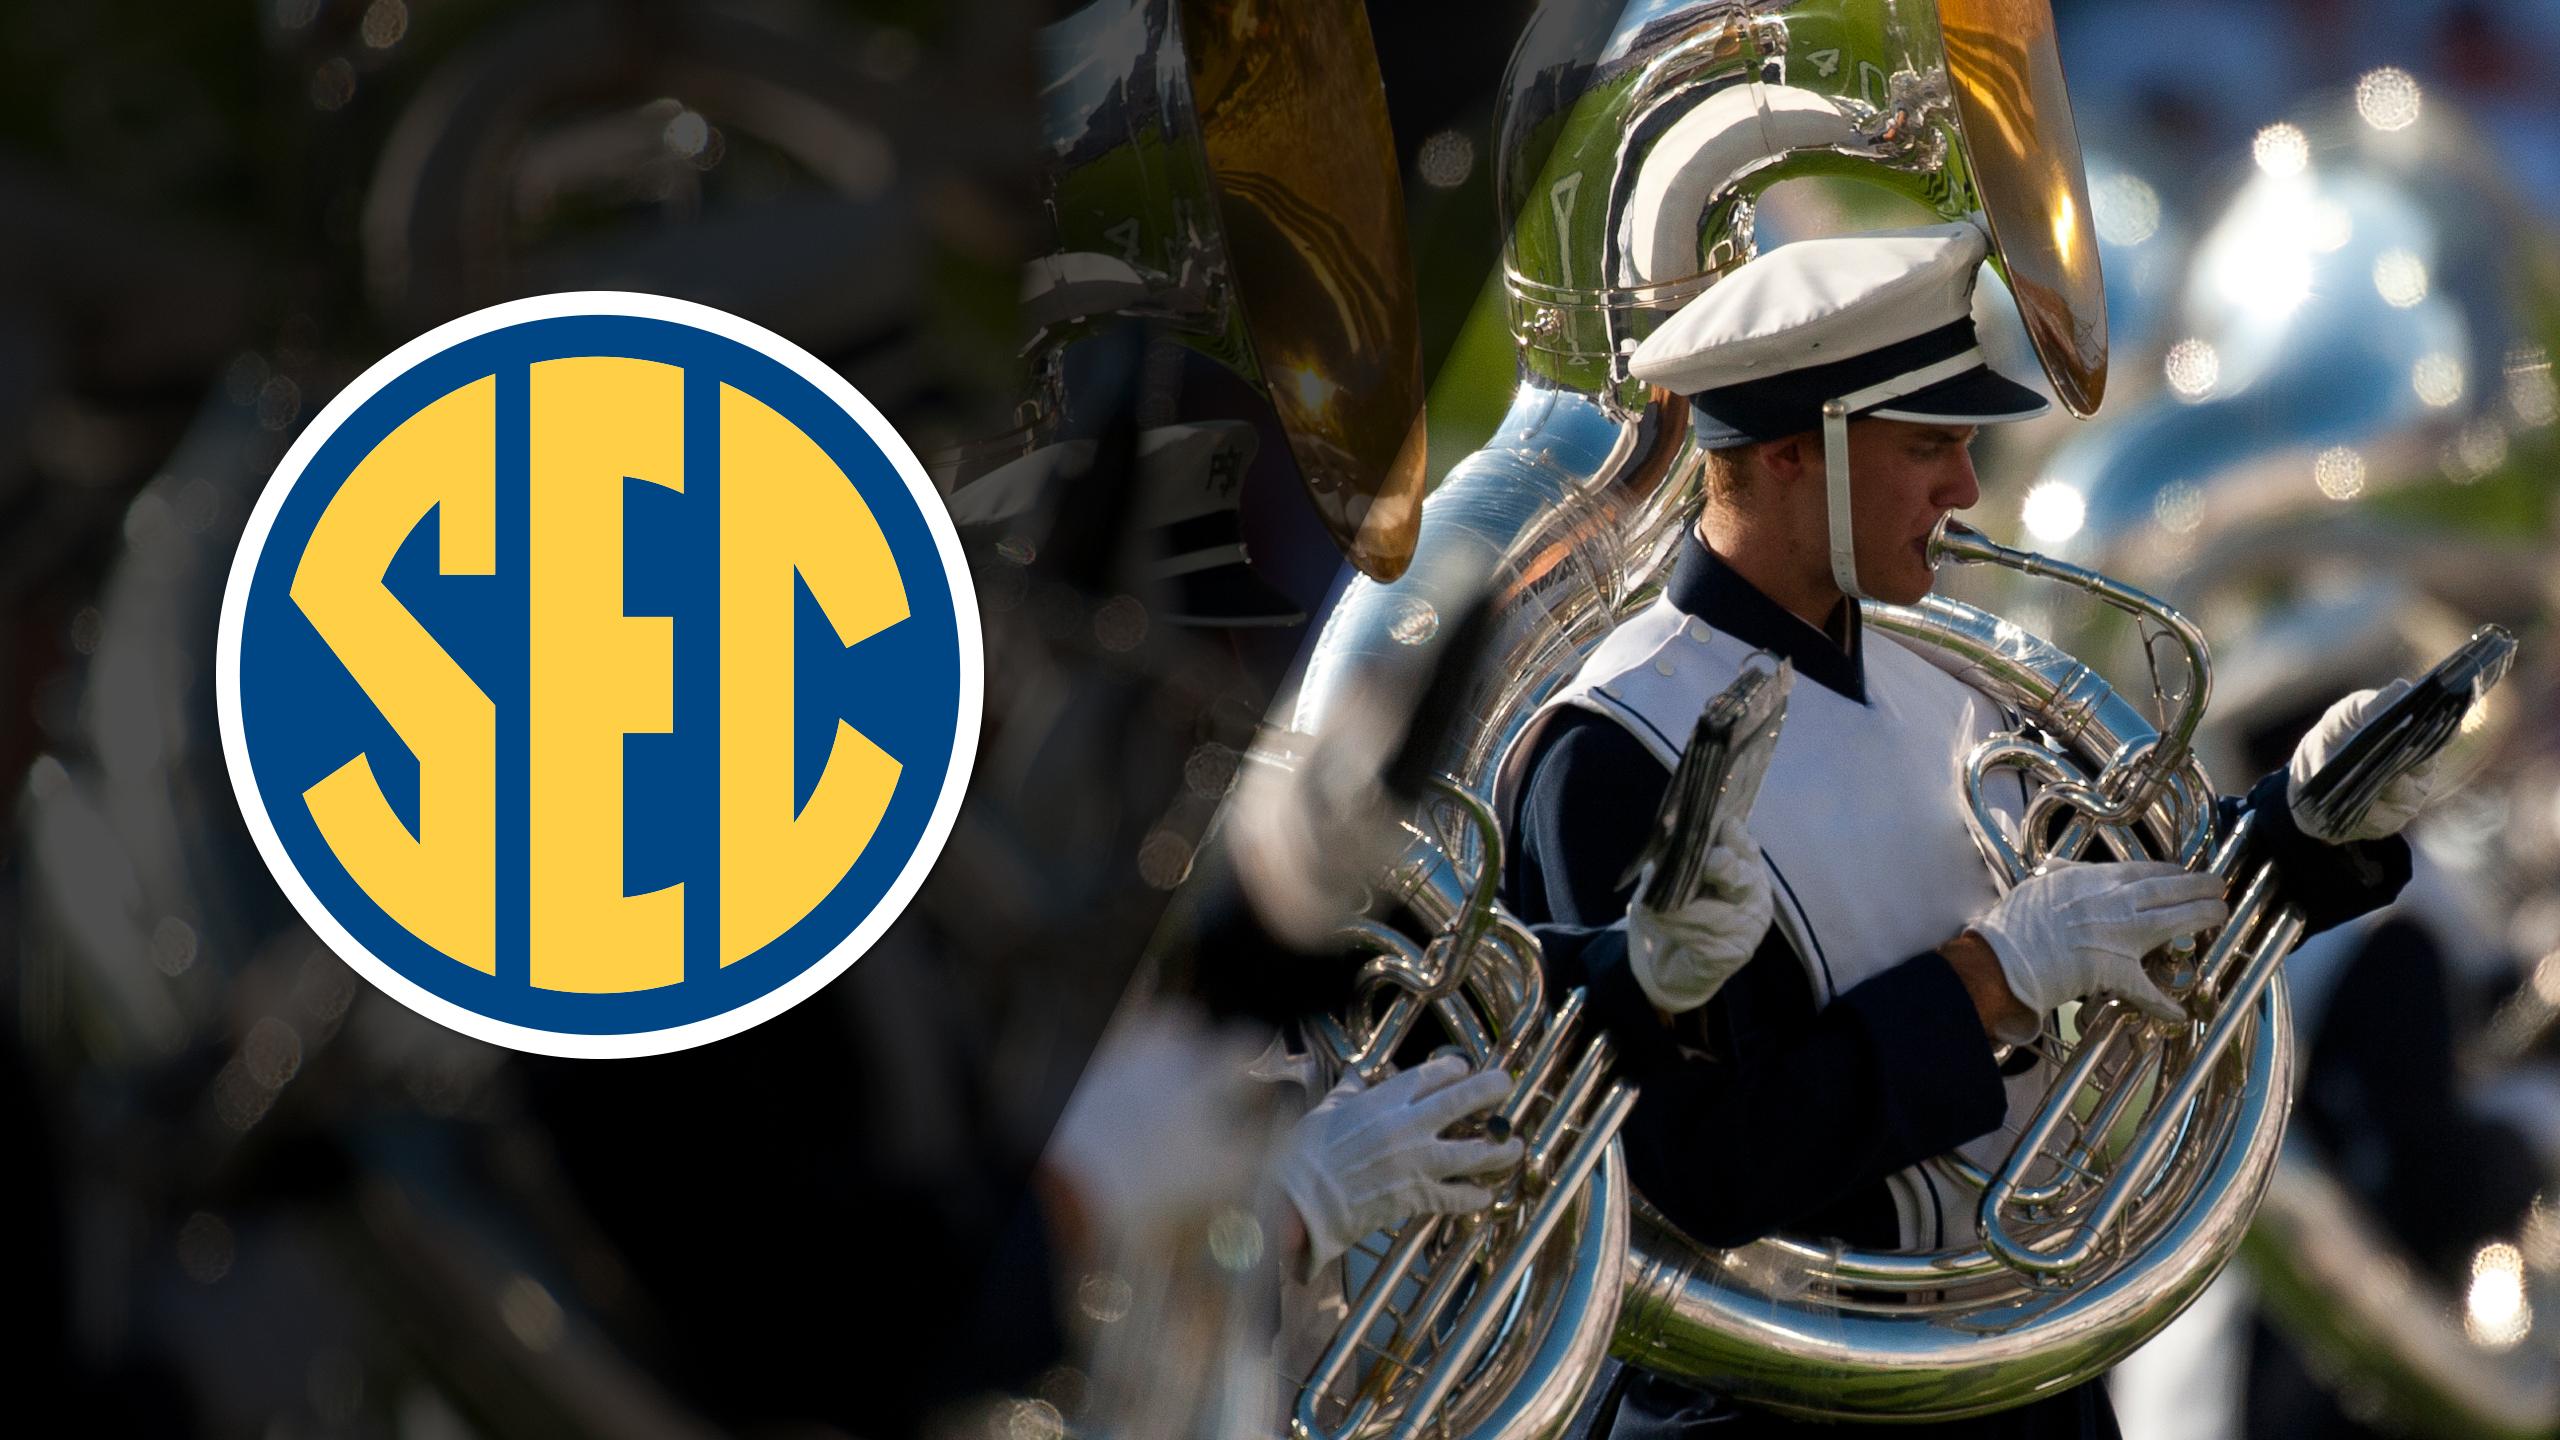 SEC Halftime Band Performances at Kentucky